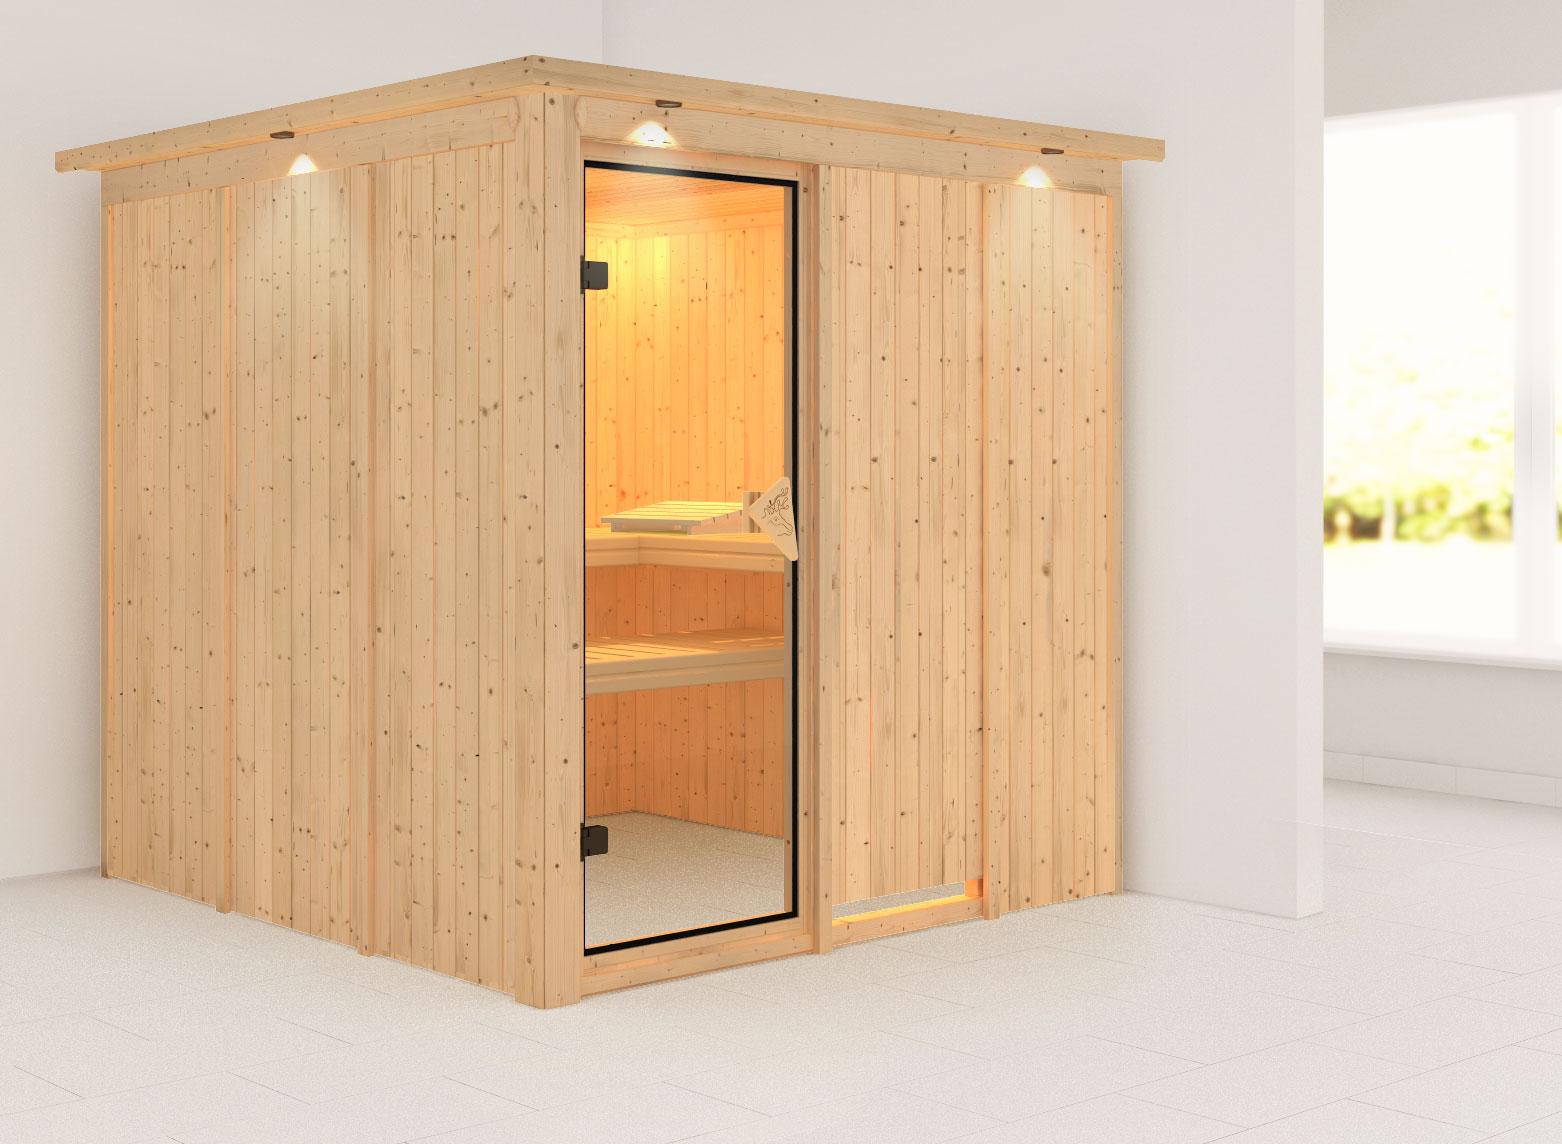 Karibu Sauna Rodin 68mm Dachkranz ohne Ofen classic Tür Bild 1